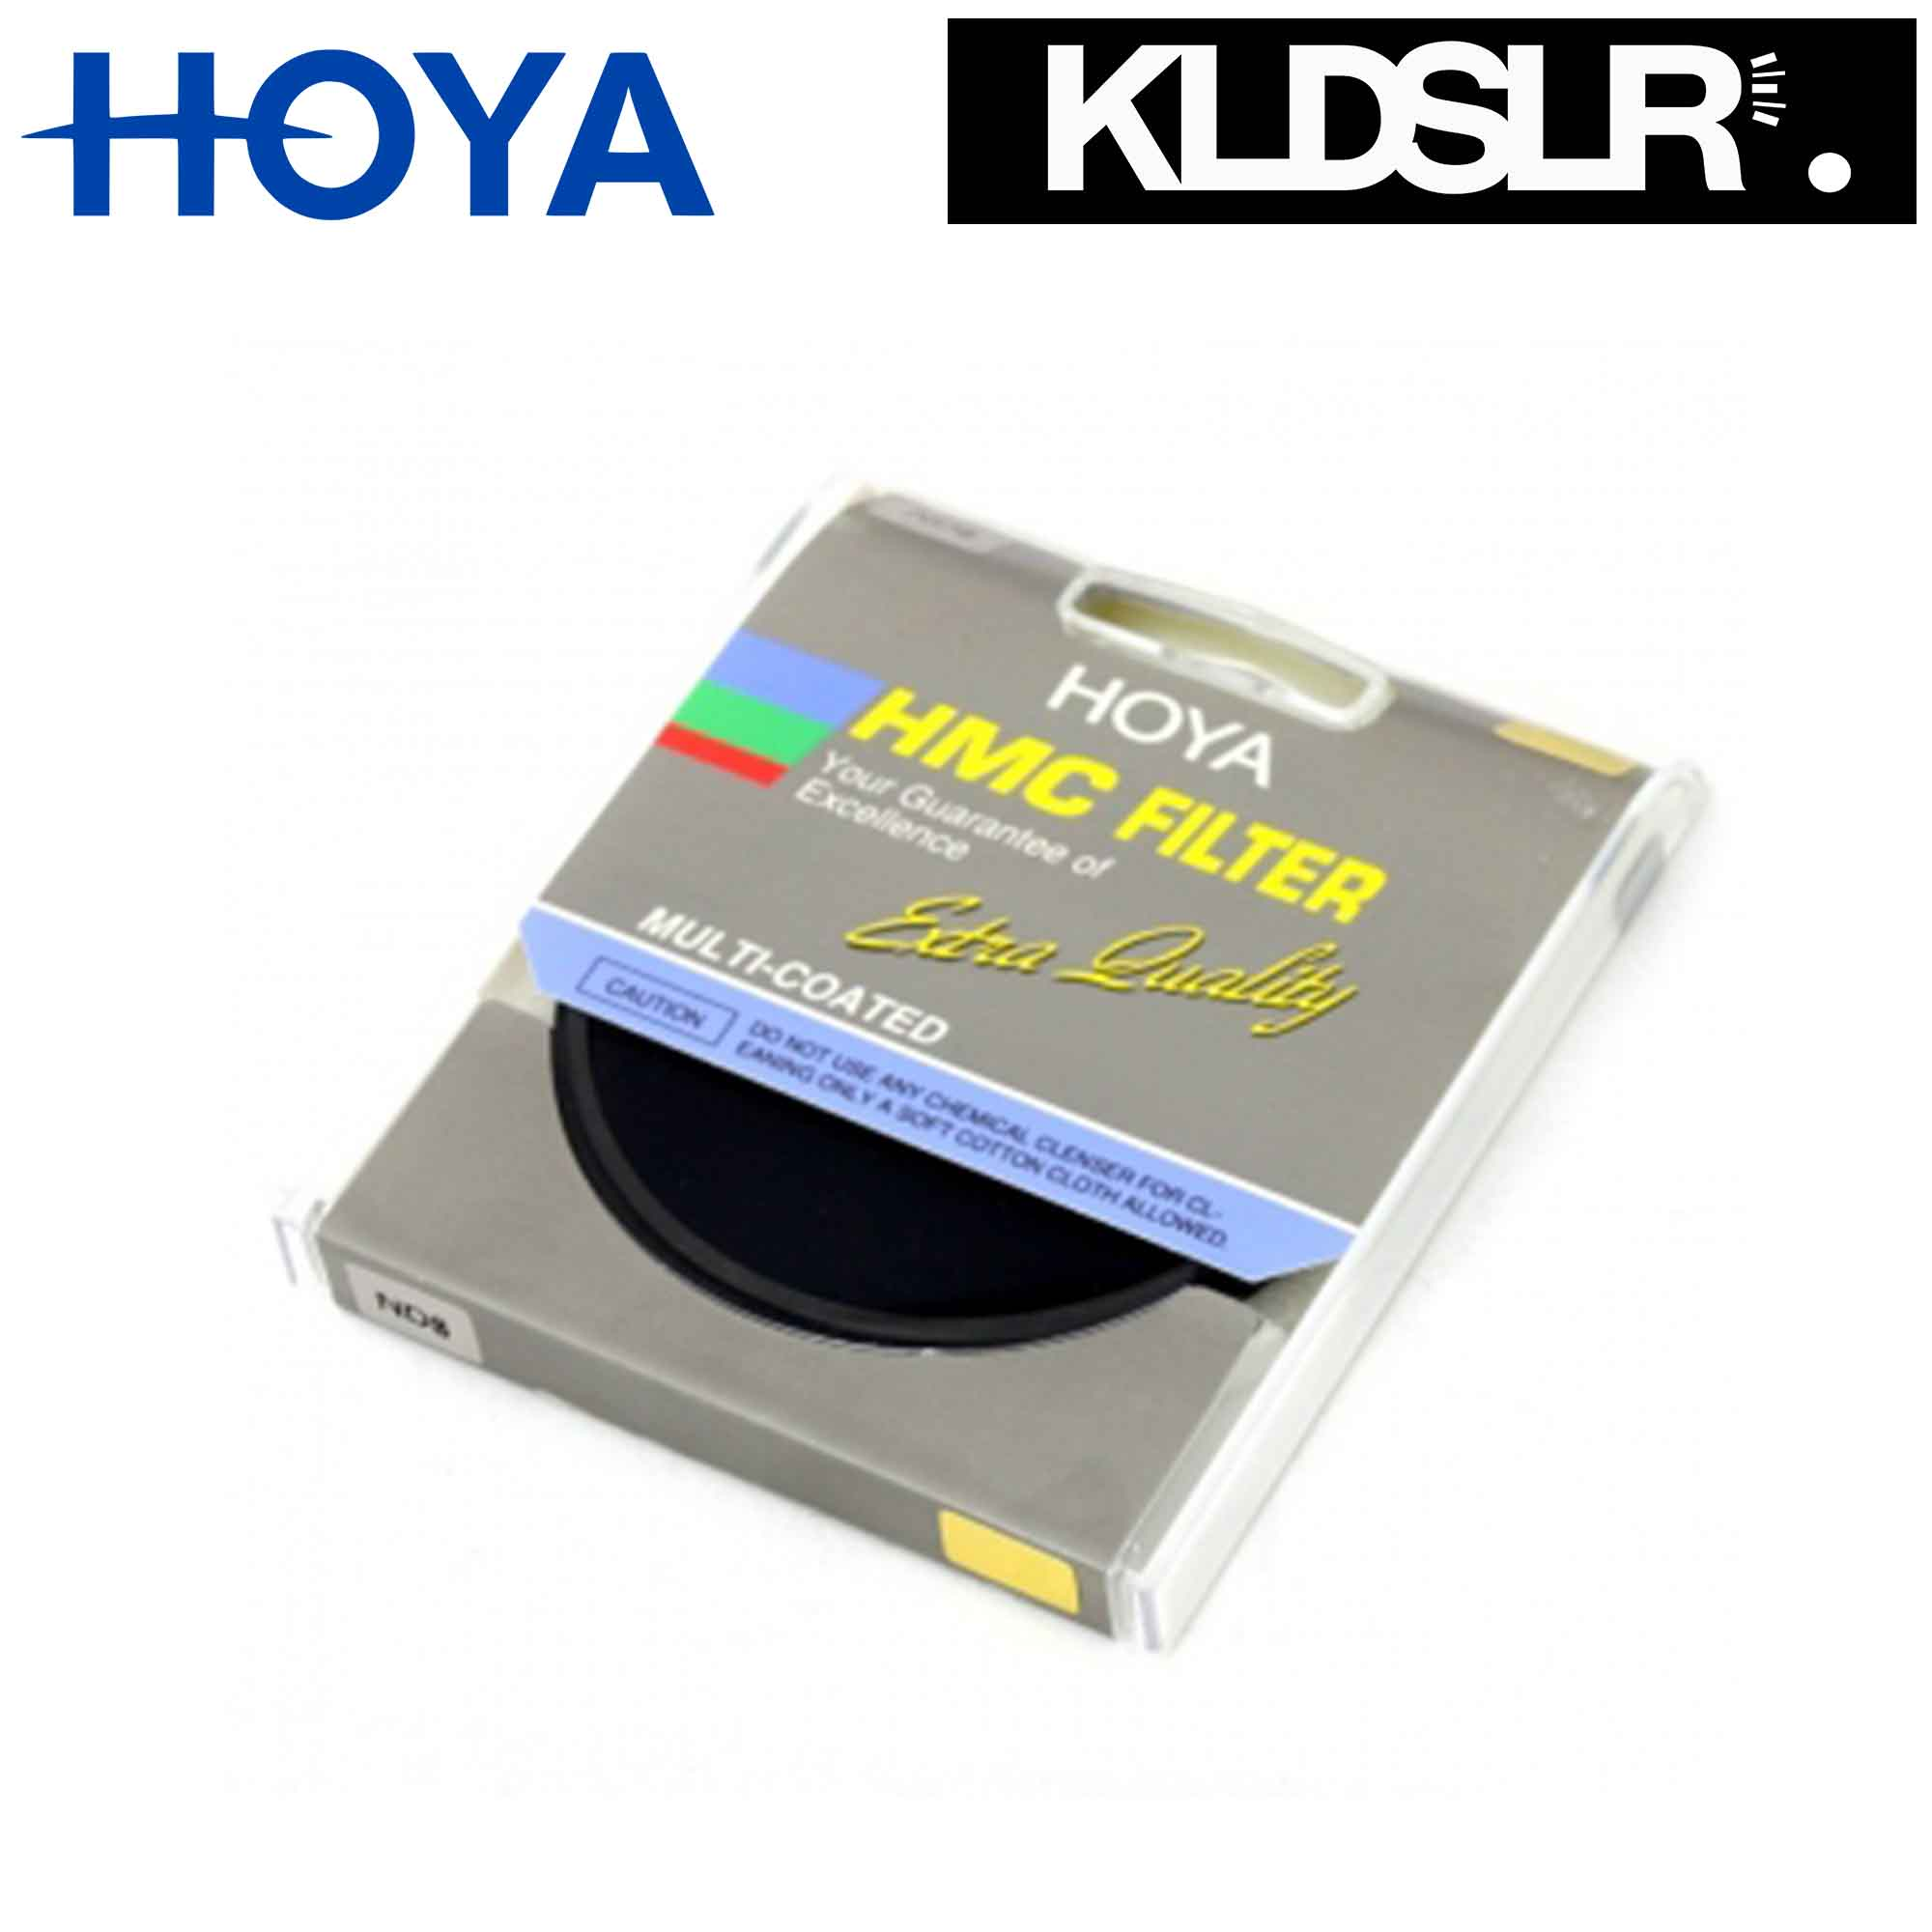 Hoya Hmc Digital Nd8 Filter Local Original Seal Unit 58mm Uv Pro 1